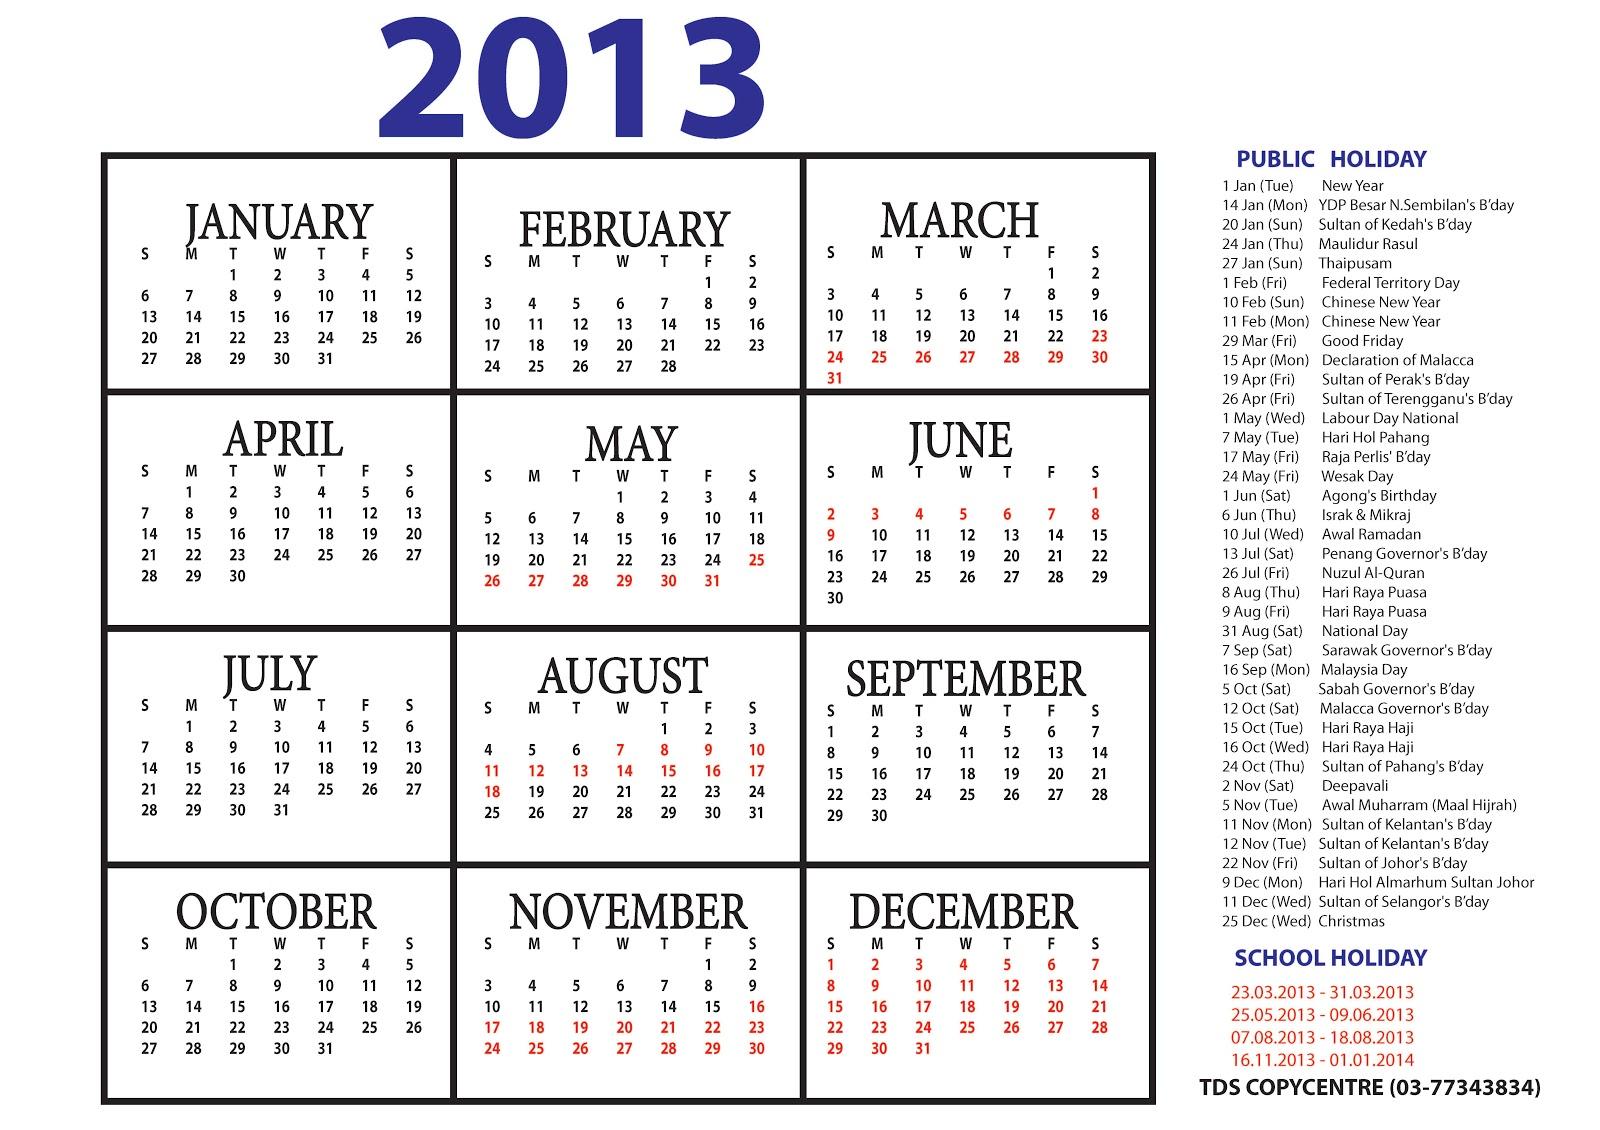 Free Printable Calendar October 2012 October 2012 Printable Calendar Eprintablecalendars Kalendar 2013 Free